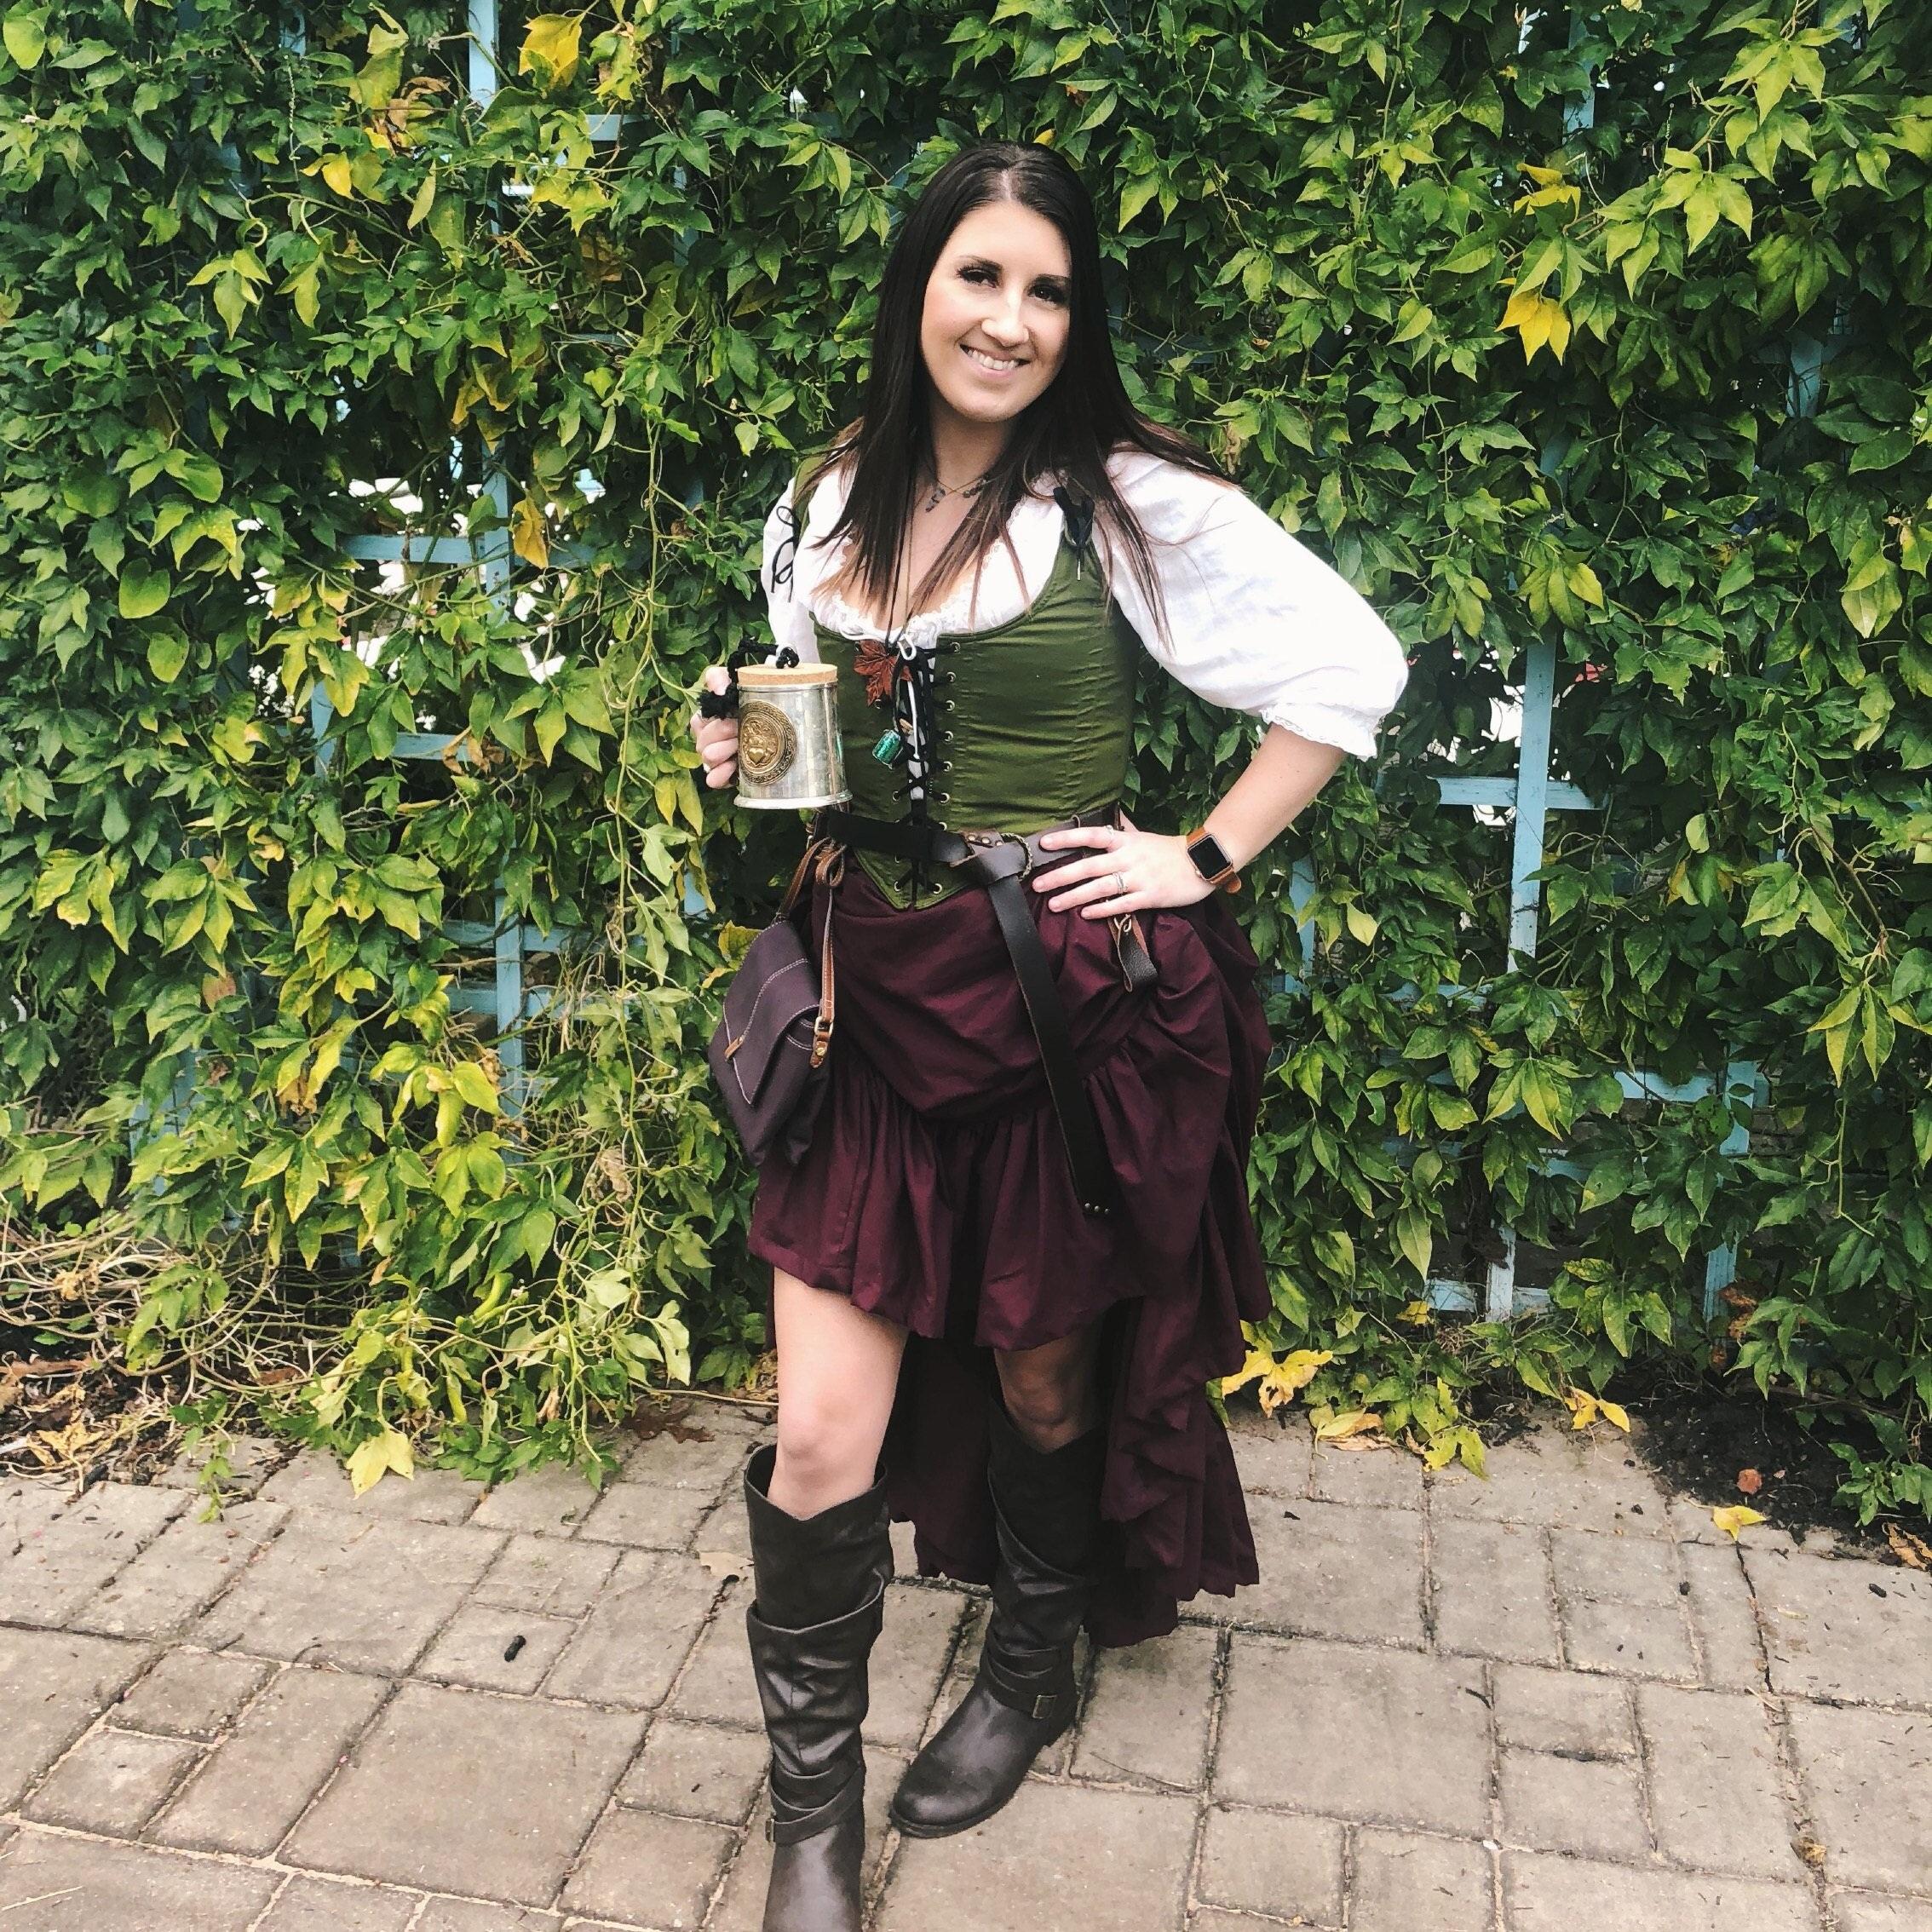 Lochlyn in Avocado bodice and Garnet skirt